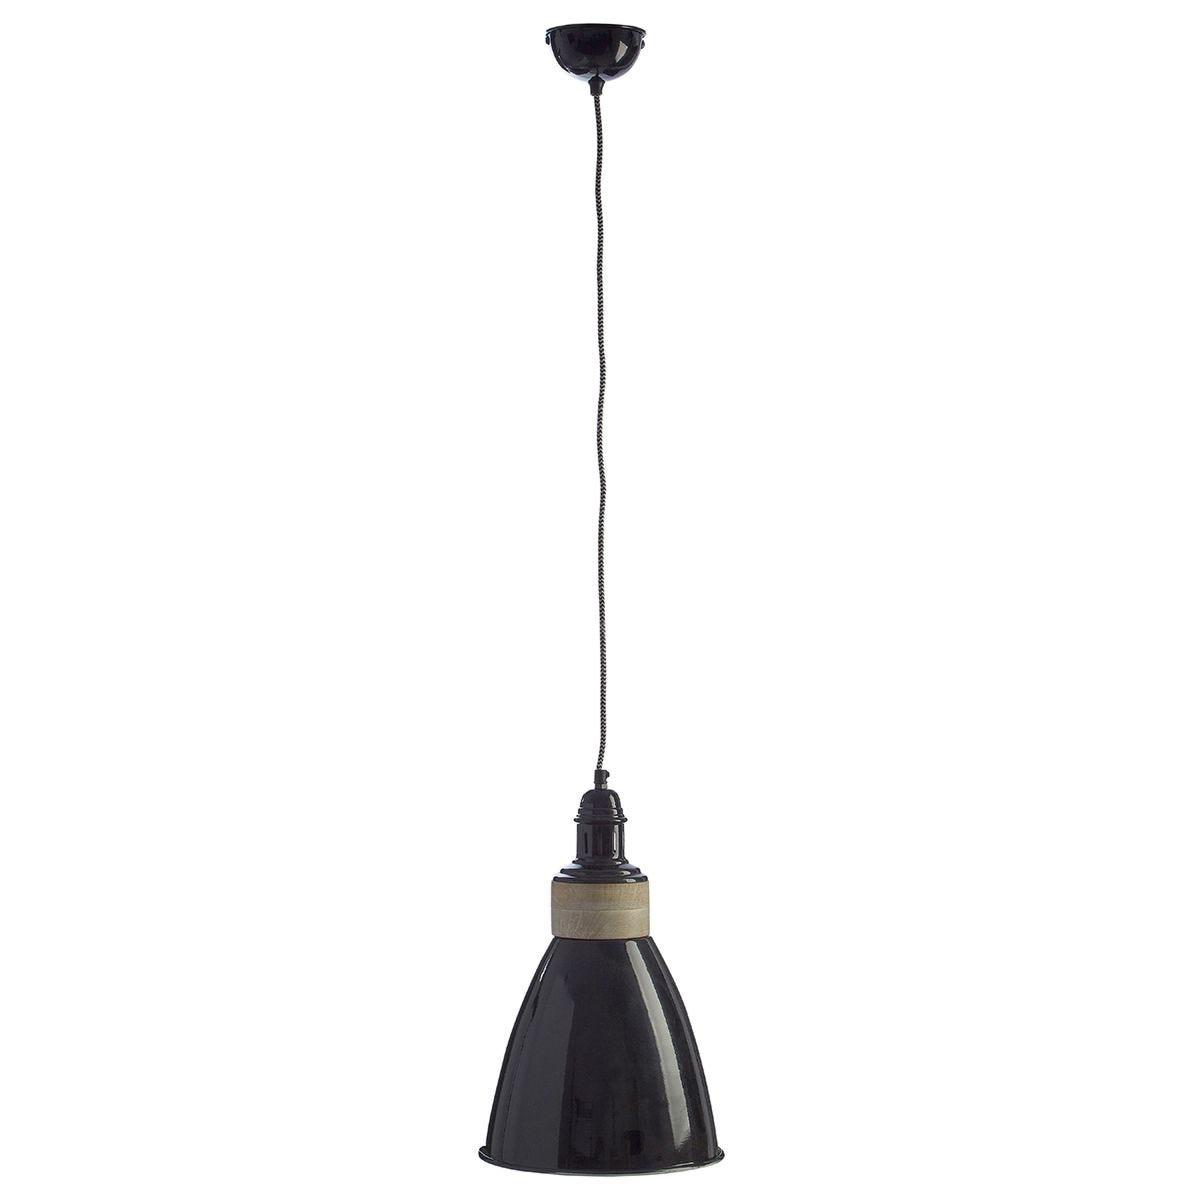 Premier Housewares Oslo Pendant Light in Iron/Wood - Black